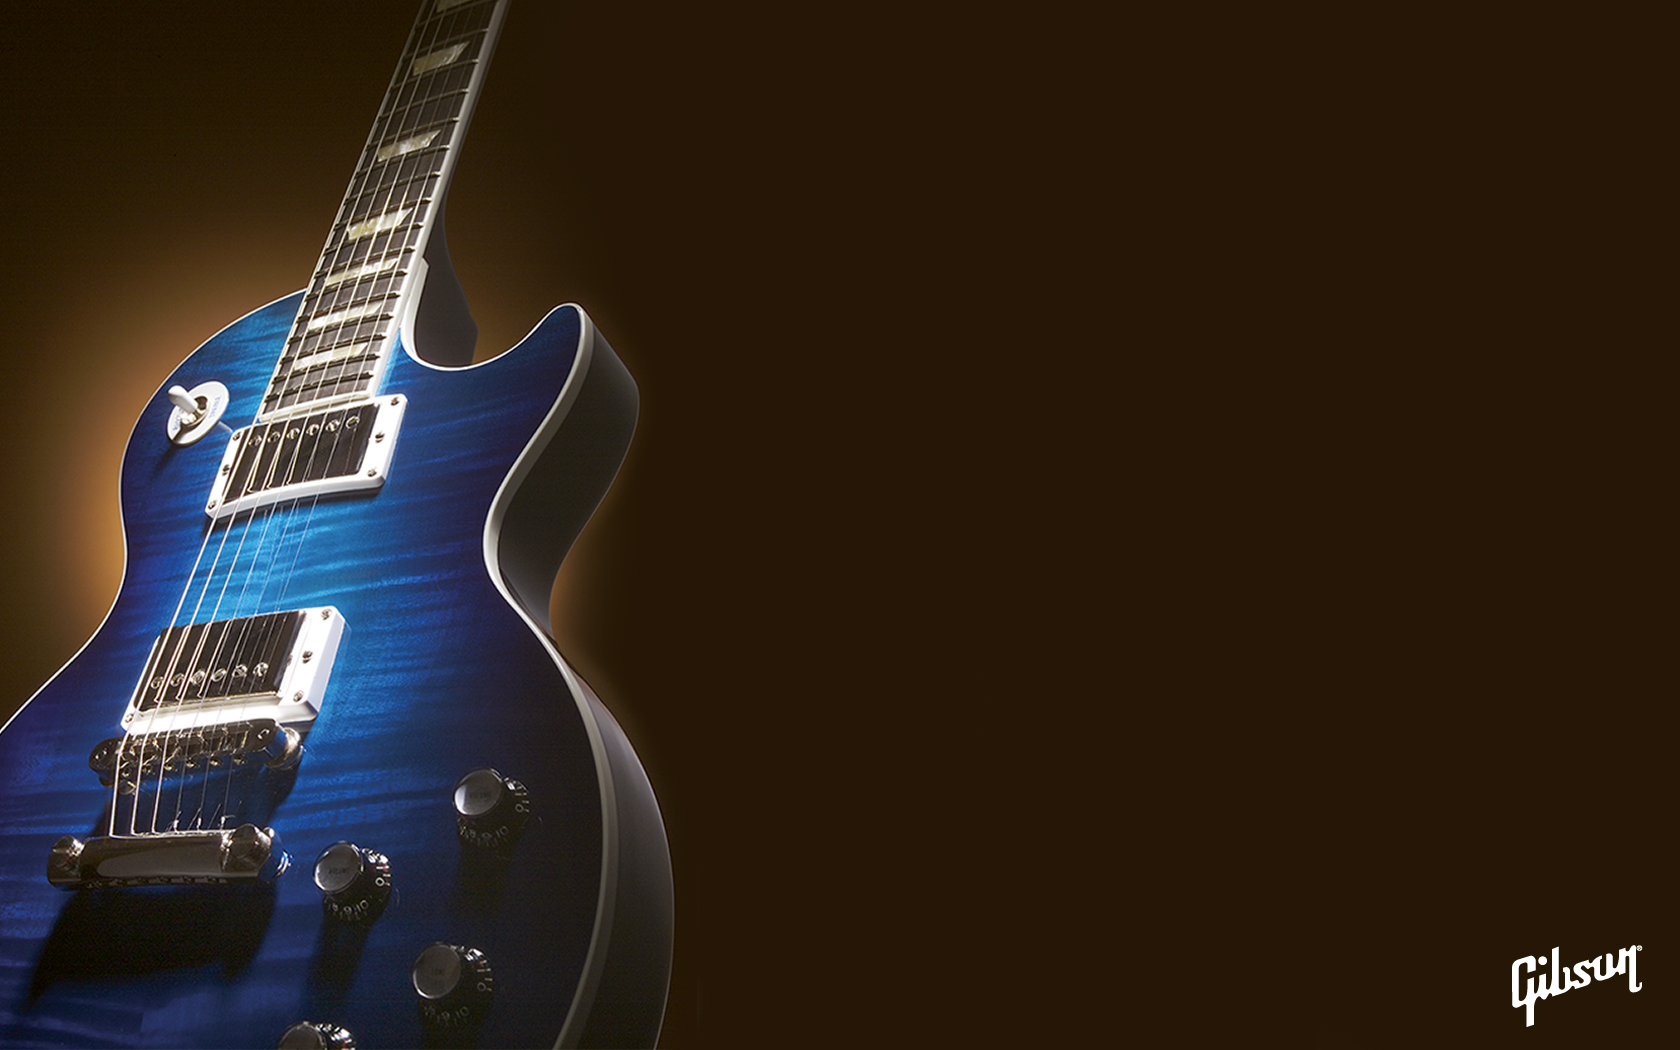 50 Gibson Guitar Wallpapers Free On Wallpapersafari